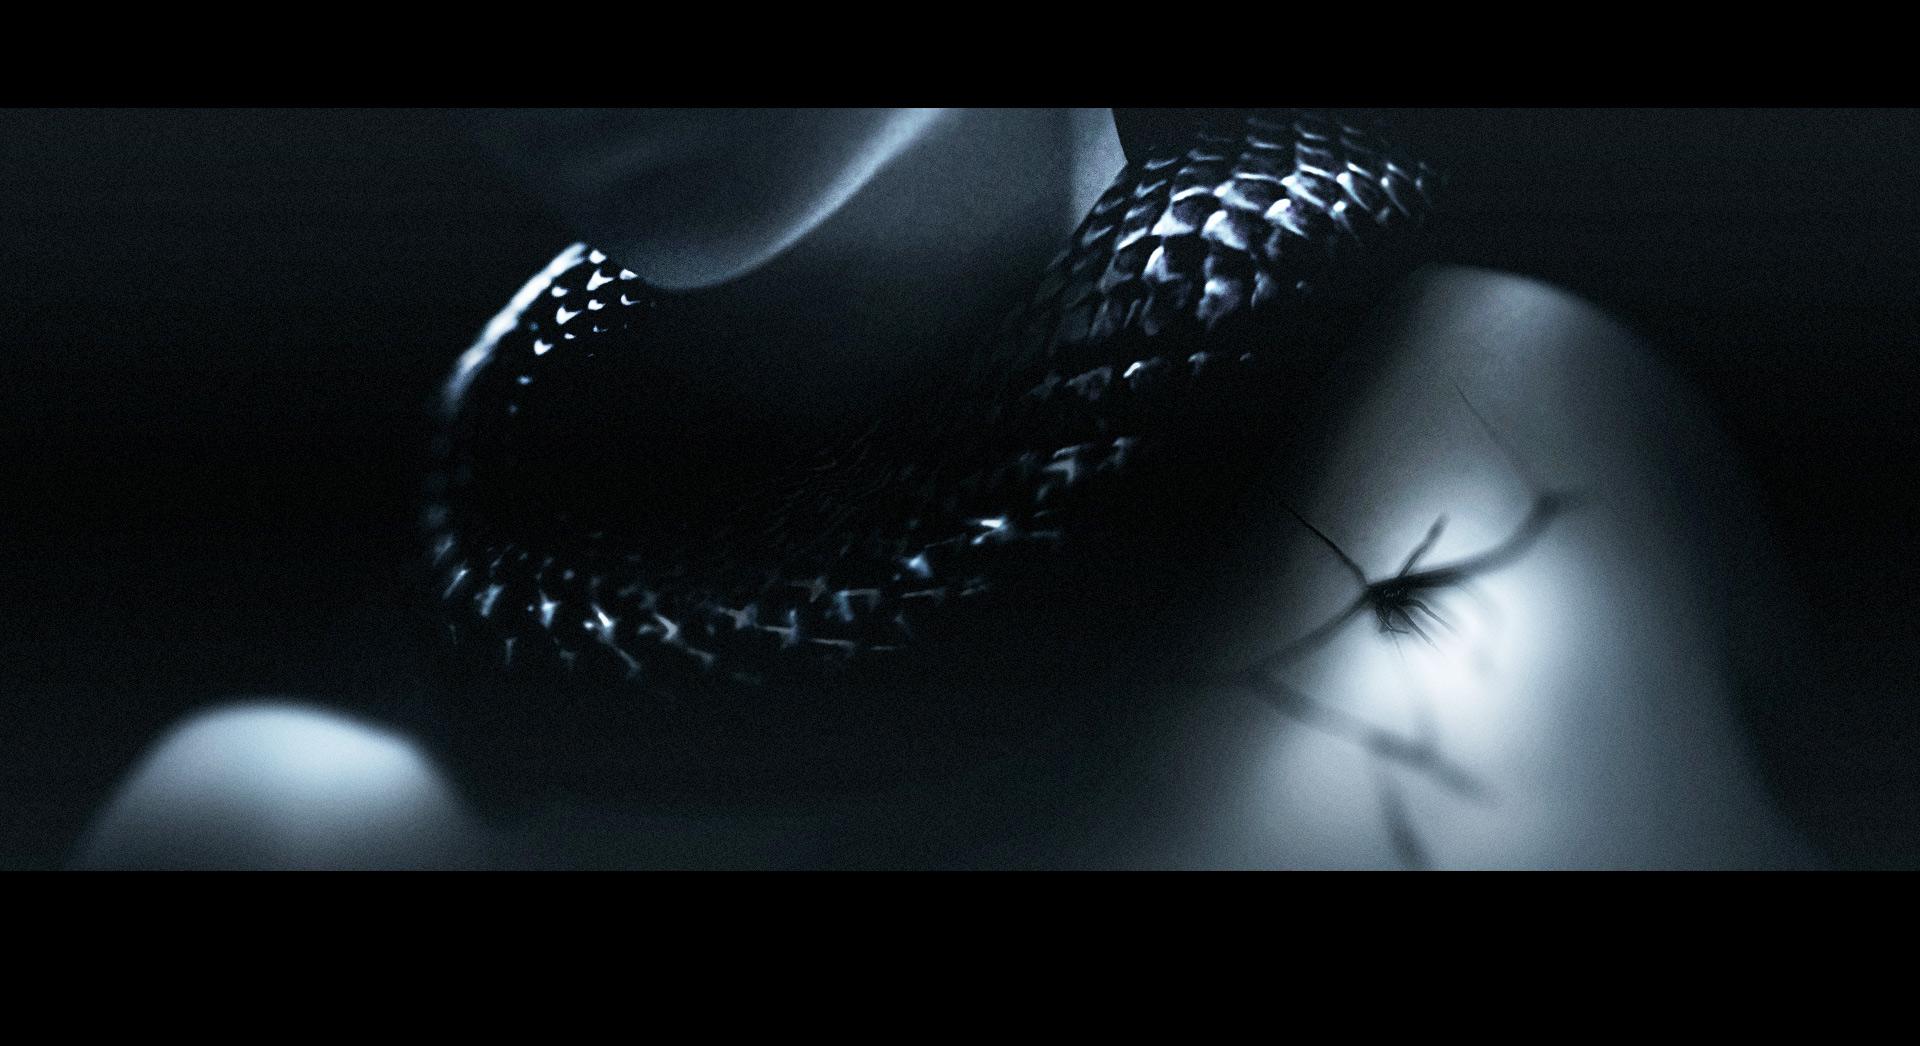 Lauren-Indovina-Penny-Dreadful-Titles-PSYOP-Concept-Art-Snake-4.jpg